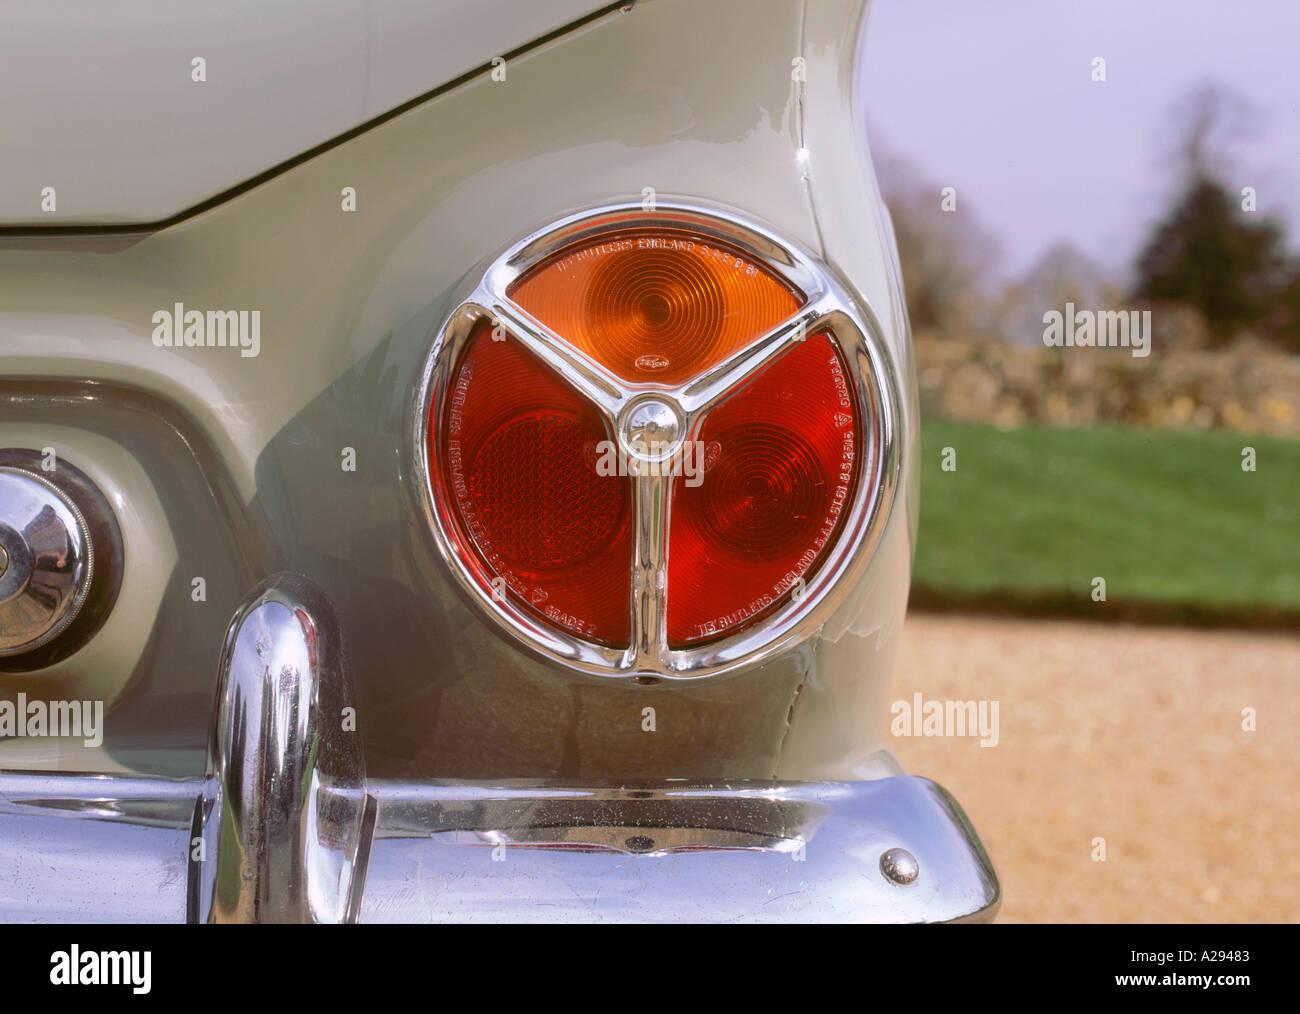 Ford Consul Cortina Rear Light Cluster Stock Image